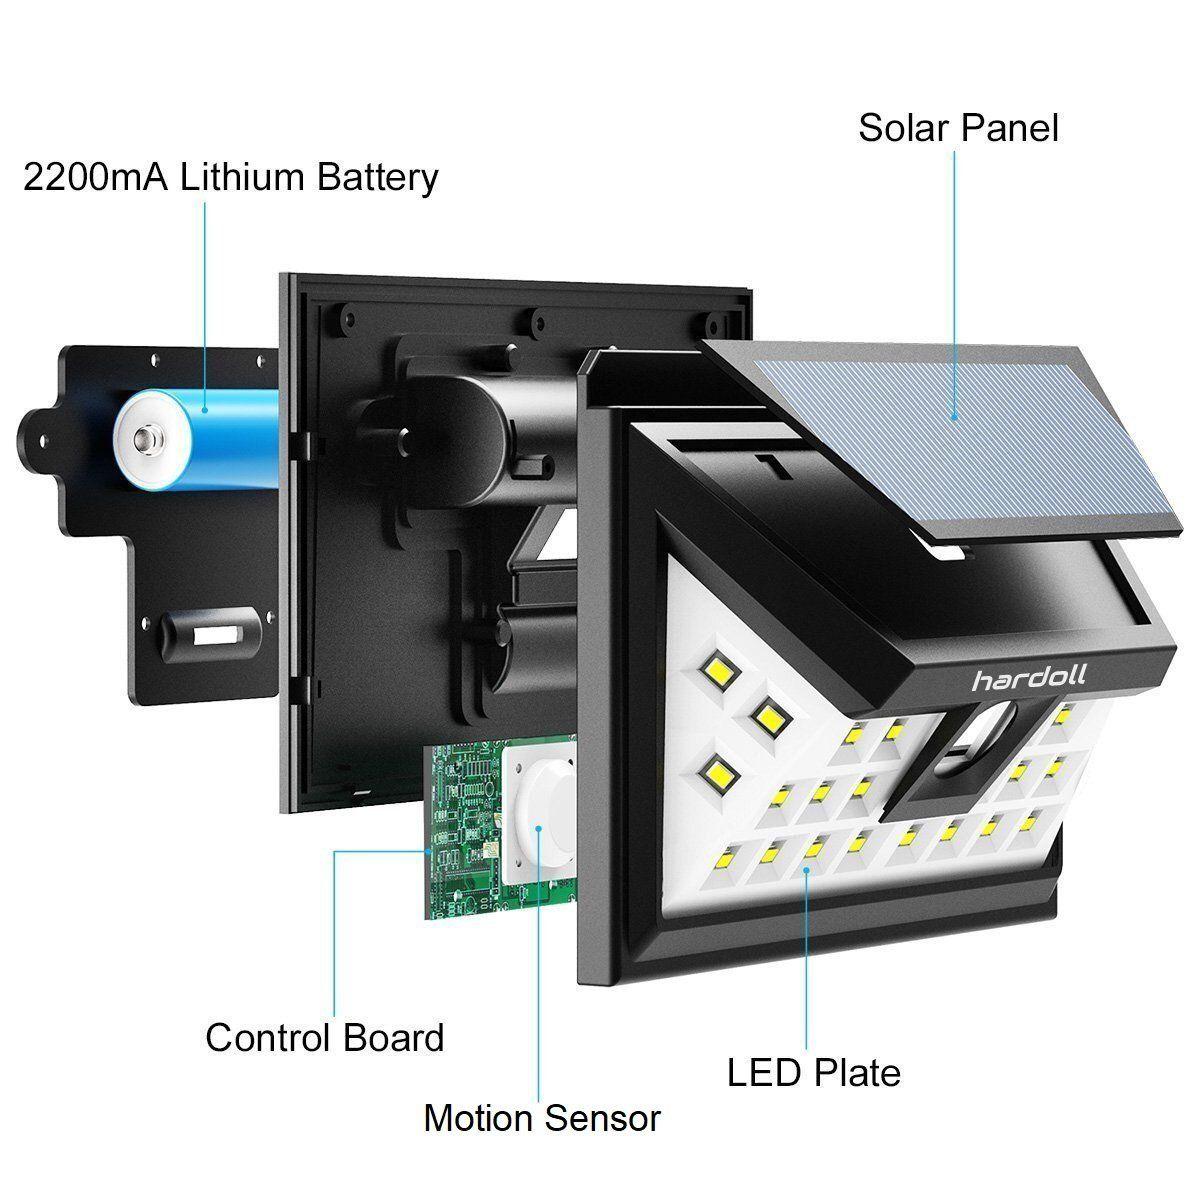 Hardoll 24 Led Solar Lights Wide Angle Outdoor Motion Sensor With 3 Leds Solar Lights Solar Powered Lights Wide Angle